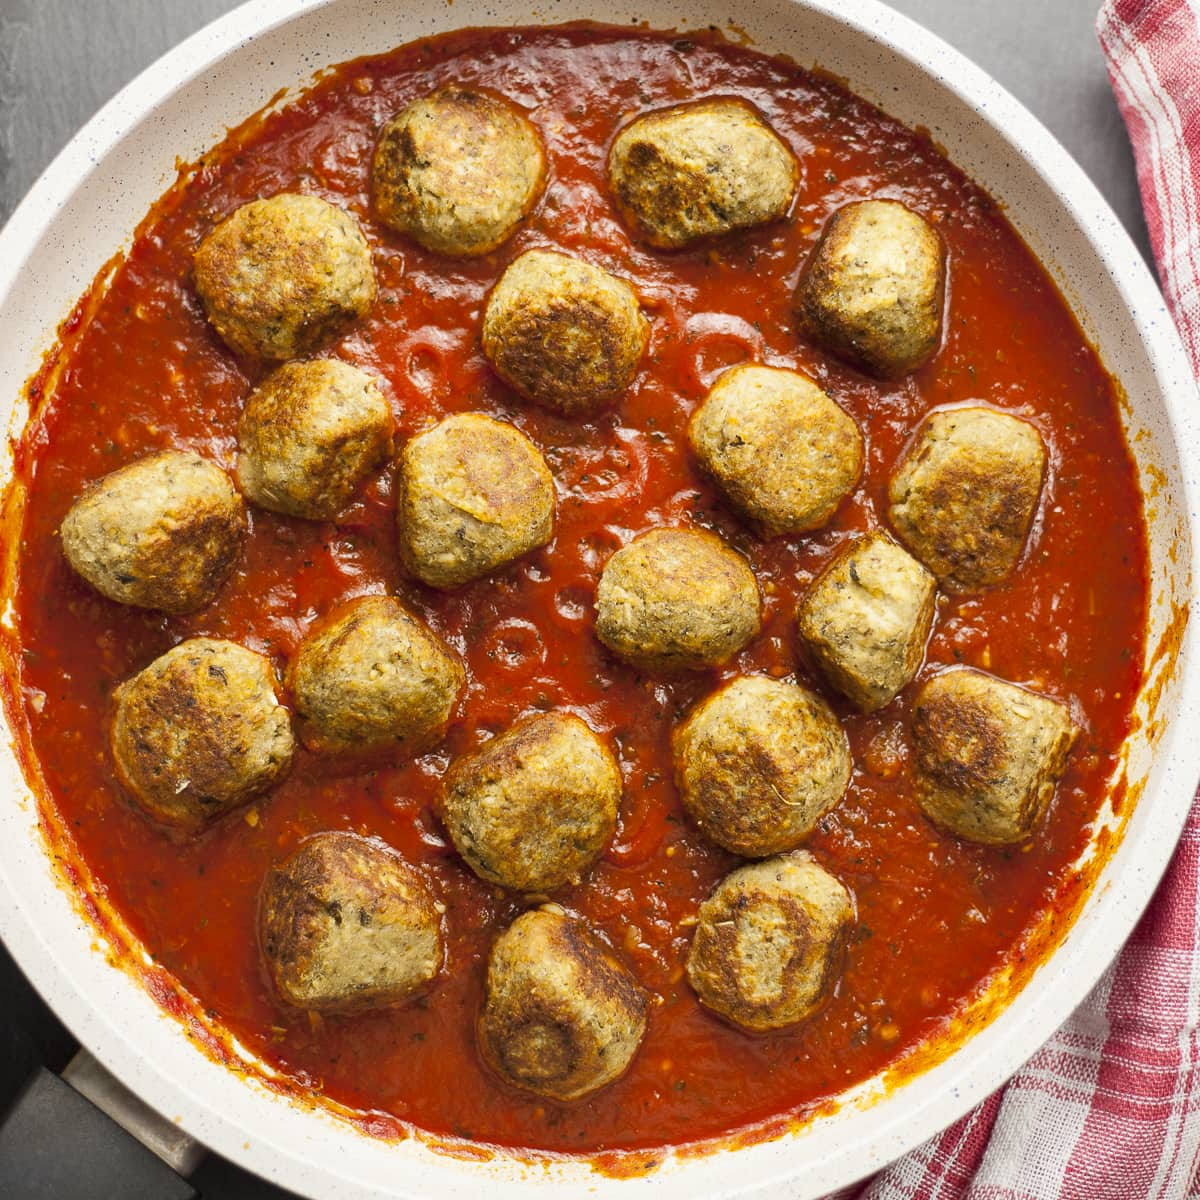 Overlay photo of a frying pan. Lot of small eggplant balls in marinara sauce